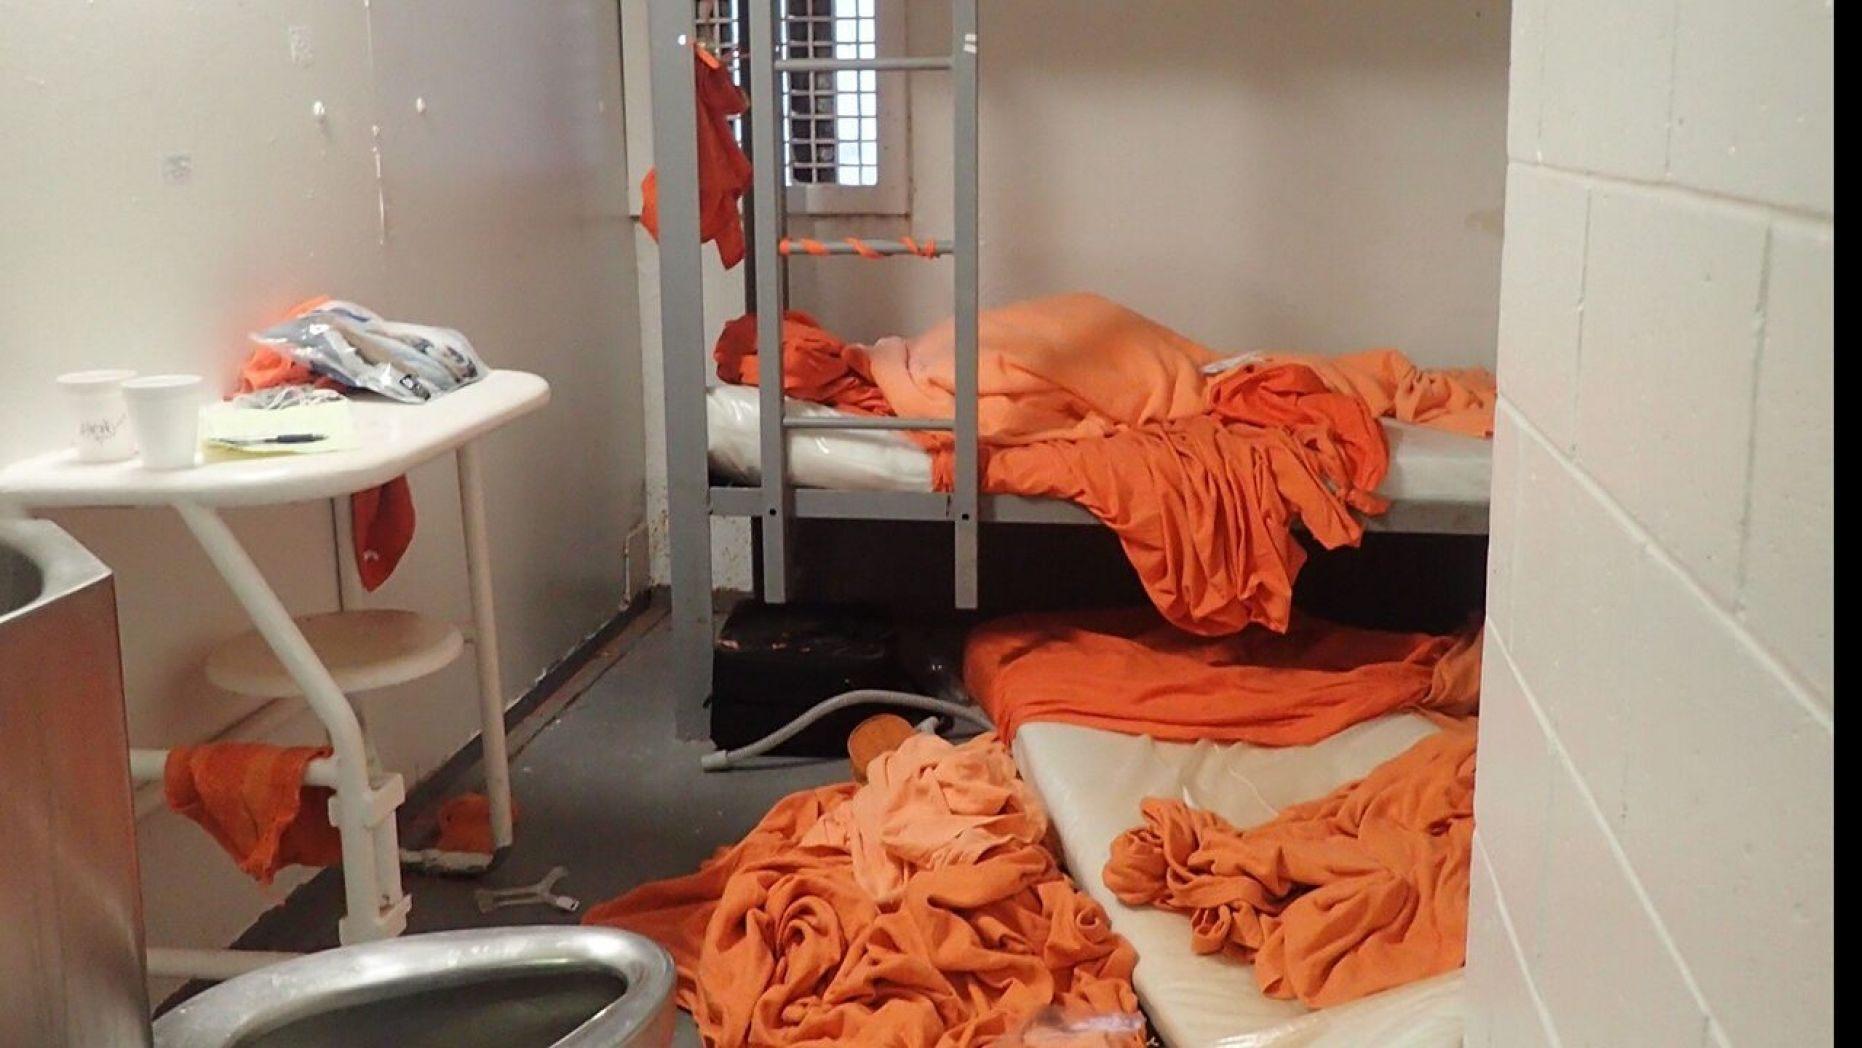 ¿Dónde fue encarcelado Jeffrey Epstein? 3